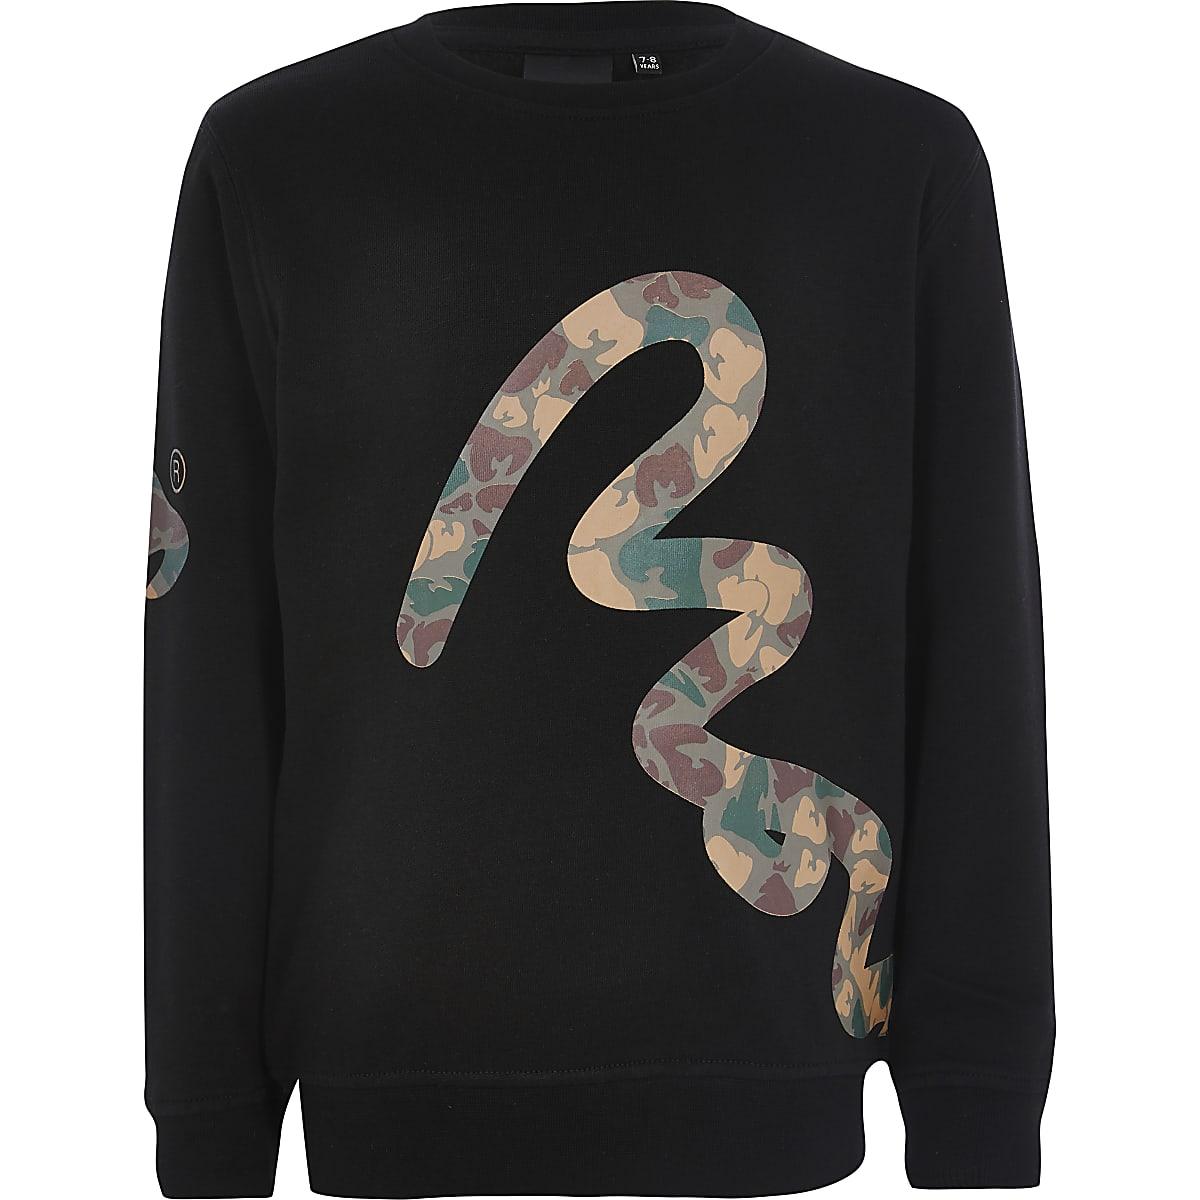 Boys Money Clothing black camo sweatshirt